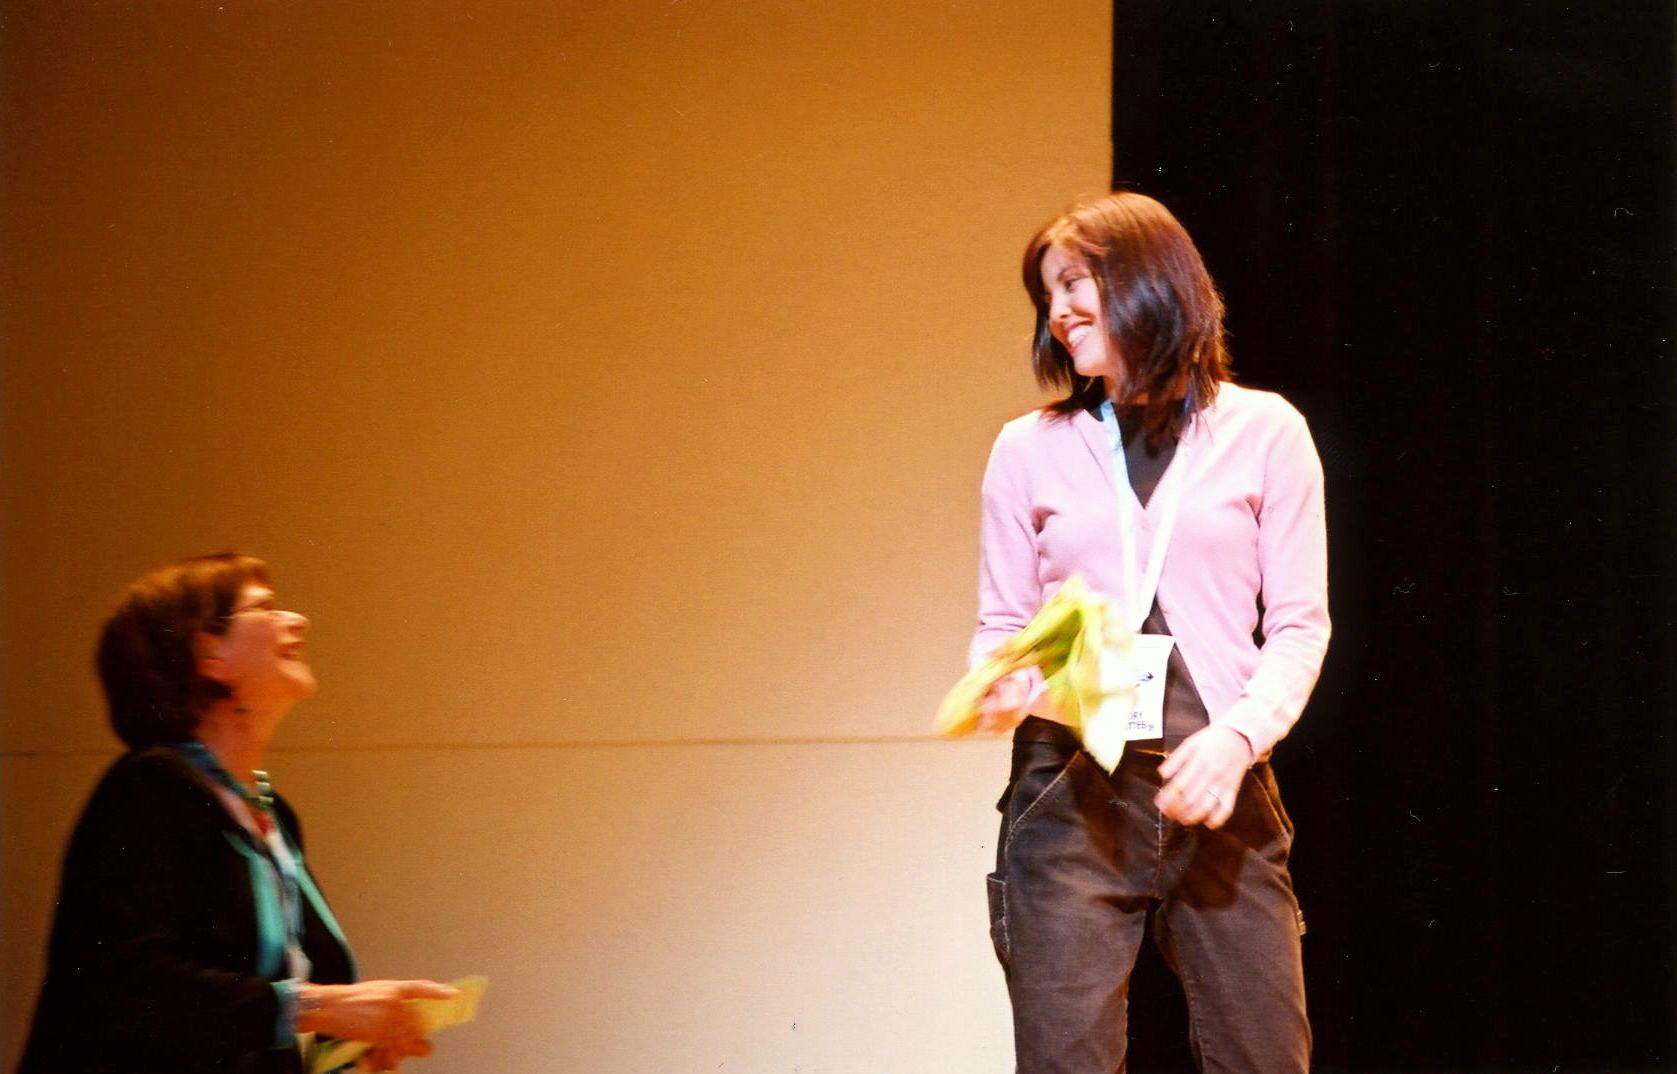 Receiving Golden Rippy Award